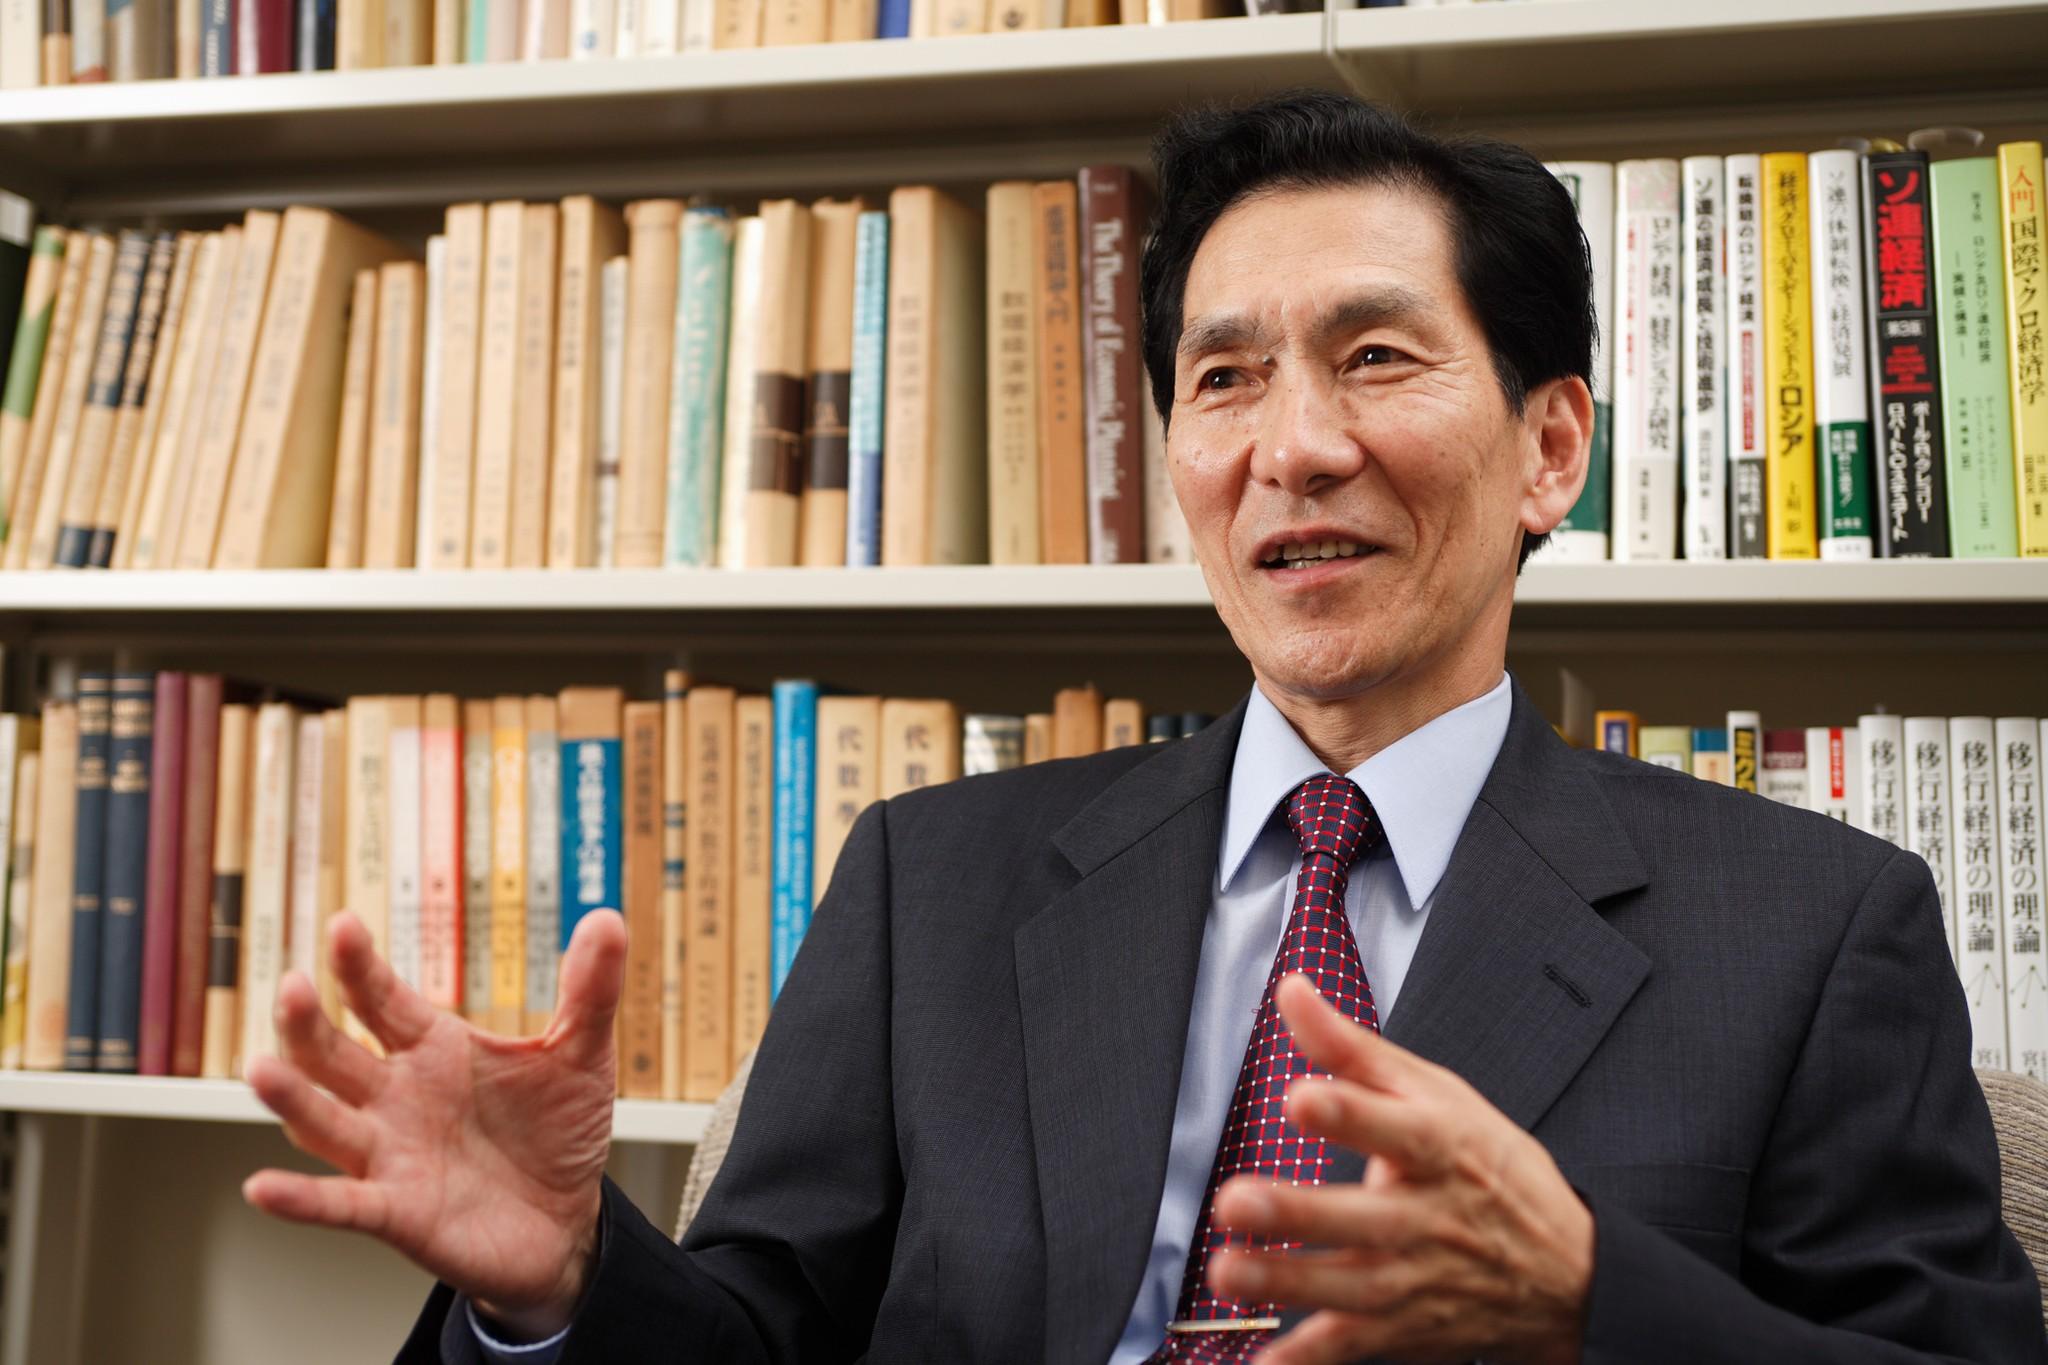 関西大学宮本名誉教授が推定 緊急事態宣言による経済的減少額